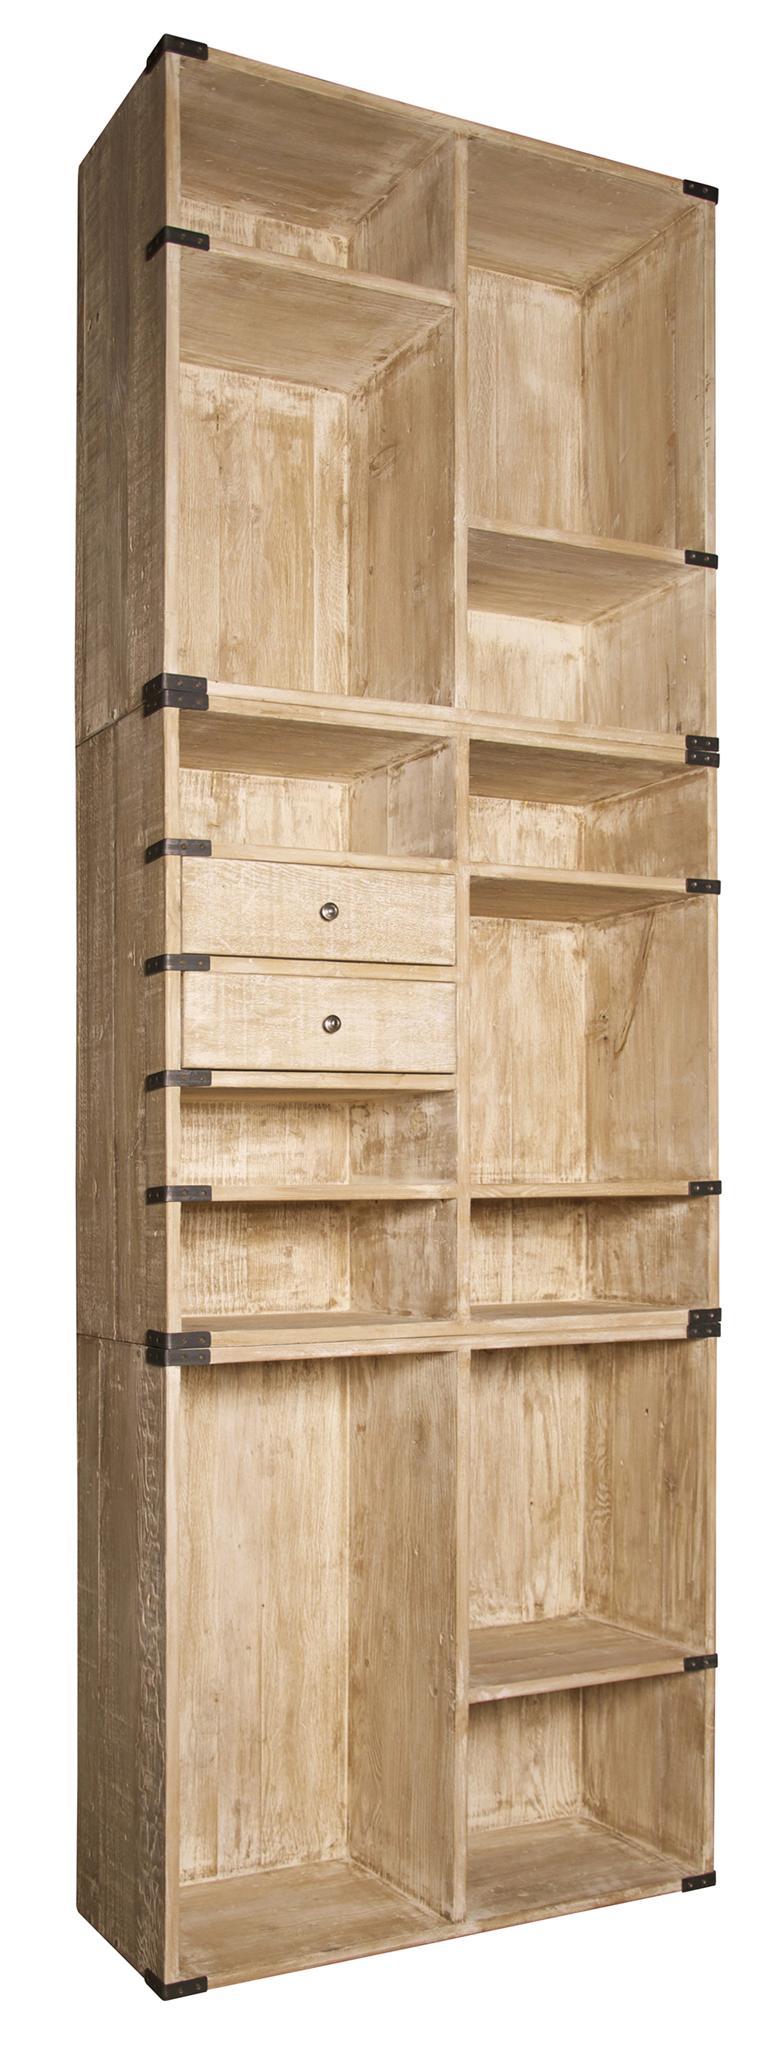 Reclaimed Lumber Bookcase